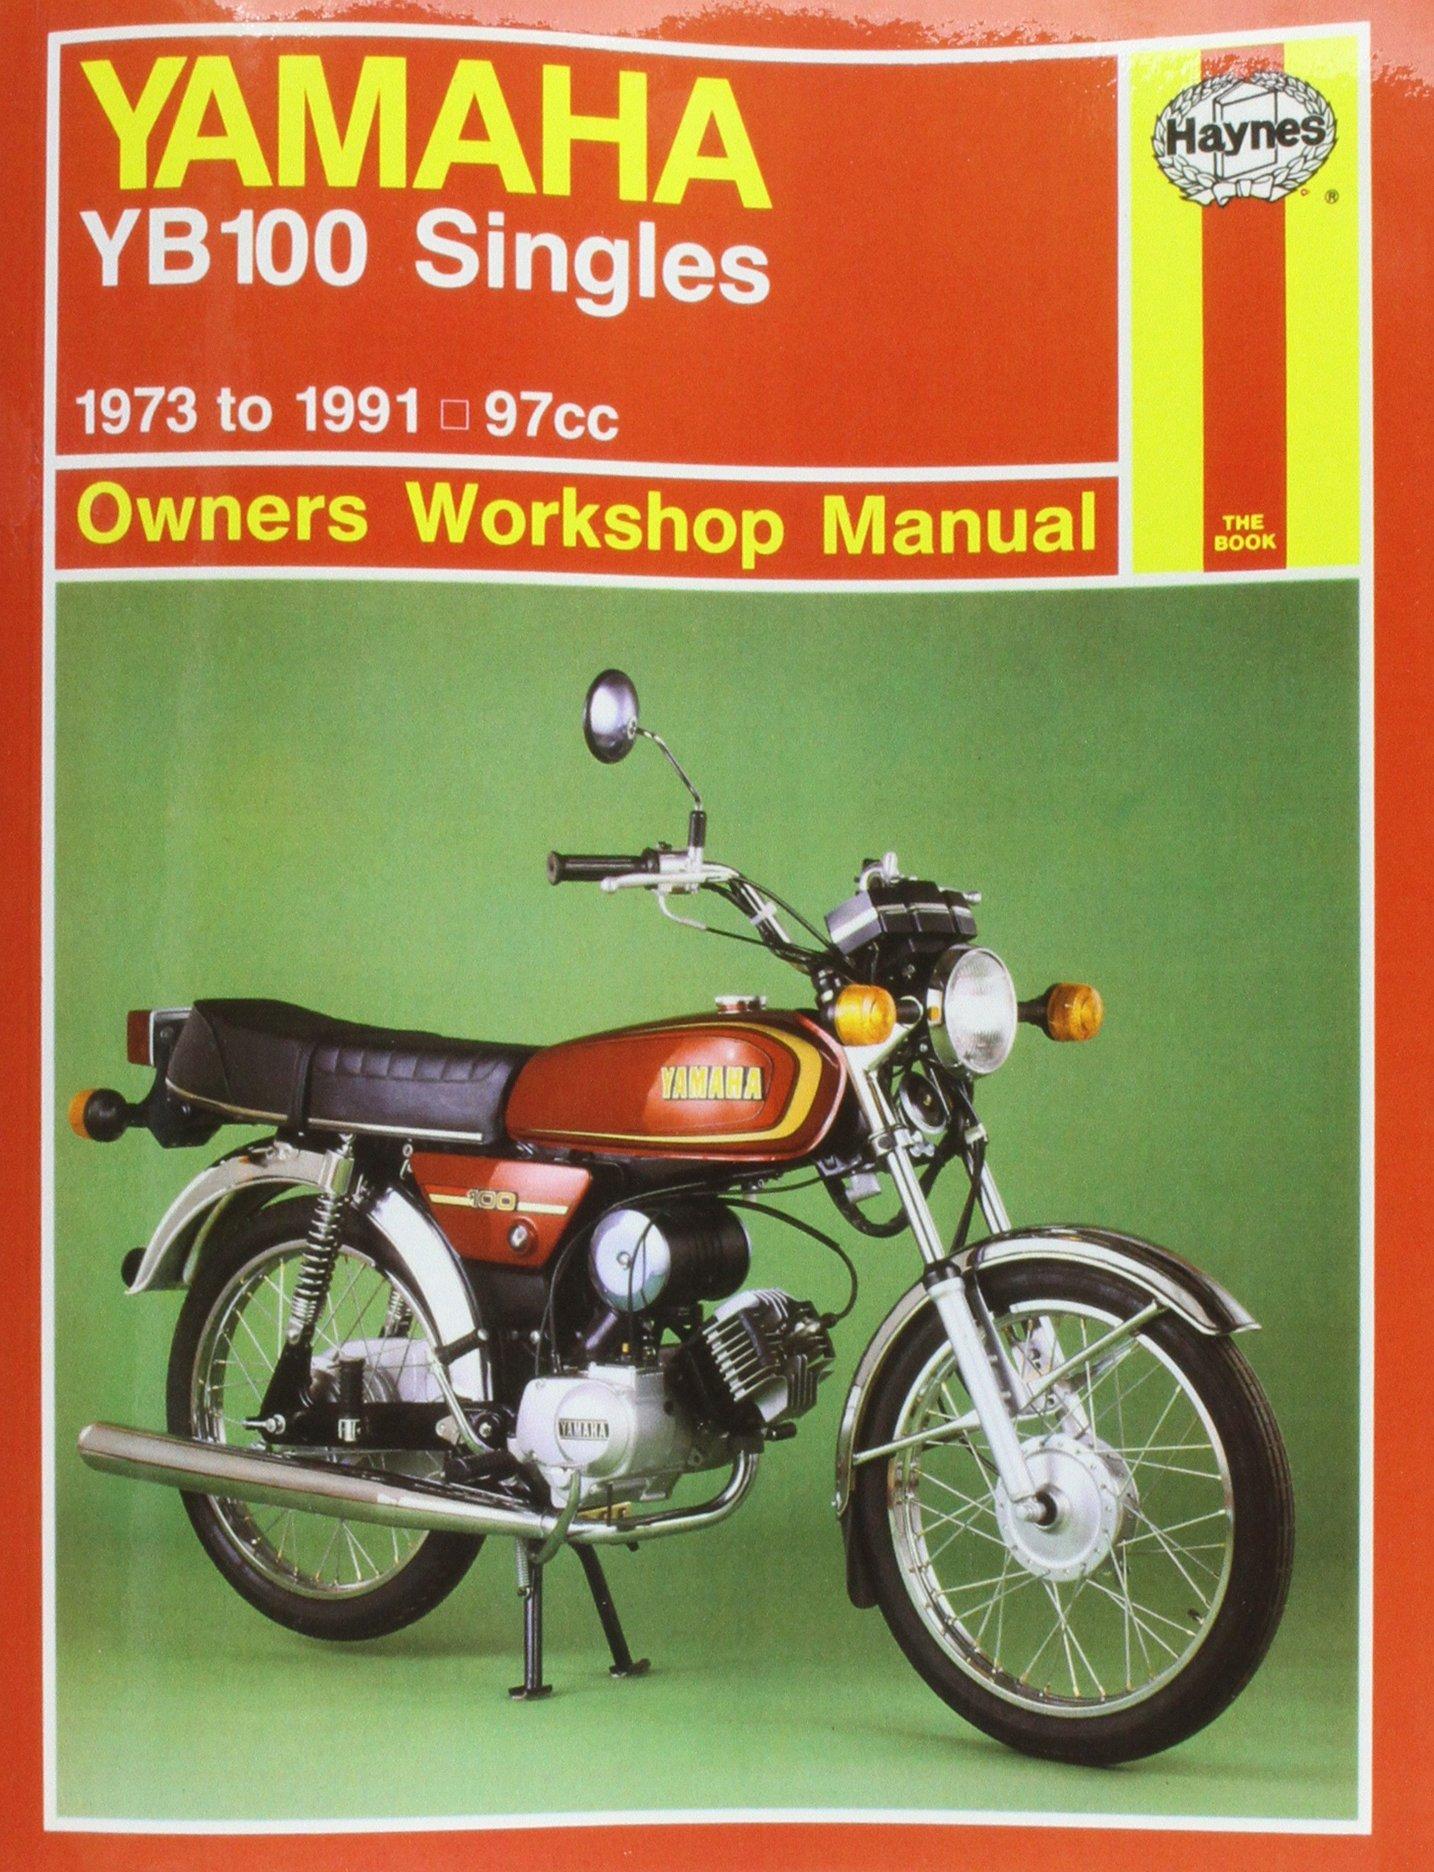 Yamaha YB100 Singles (Motorcycle Manuals): Pete Shoemark: 9781850108412:  Amazon.com: Books